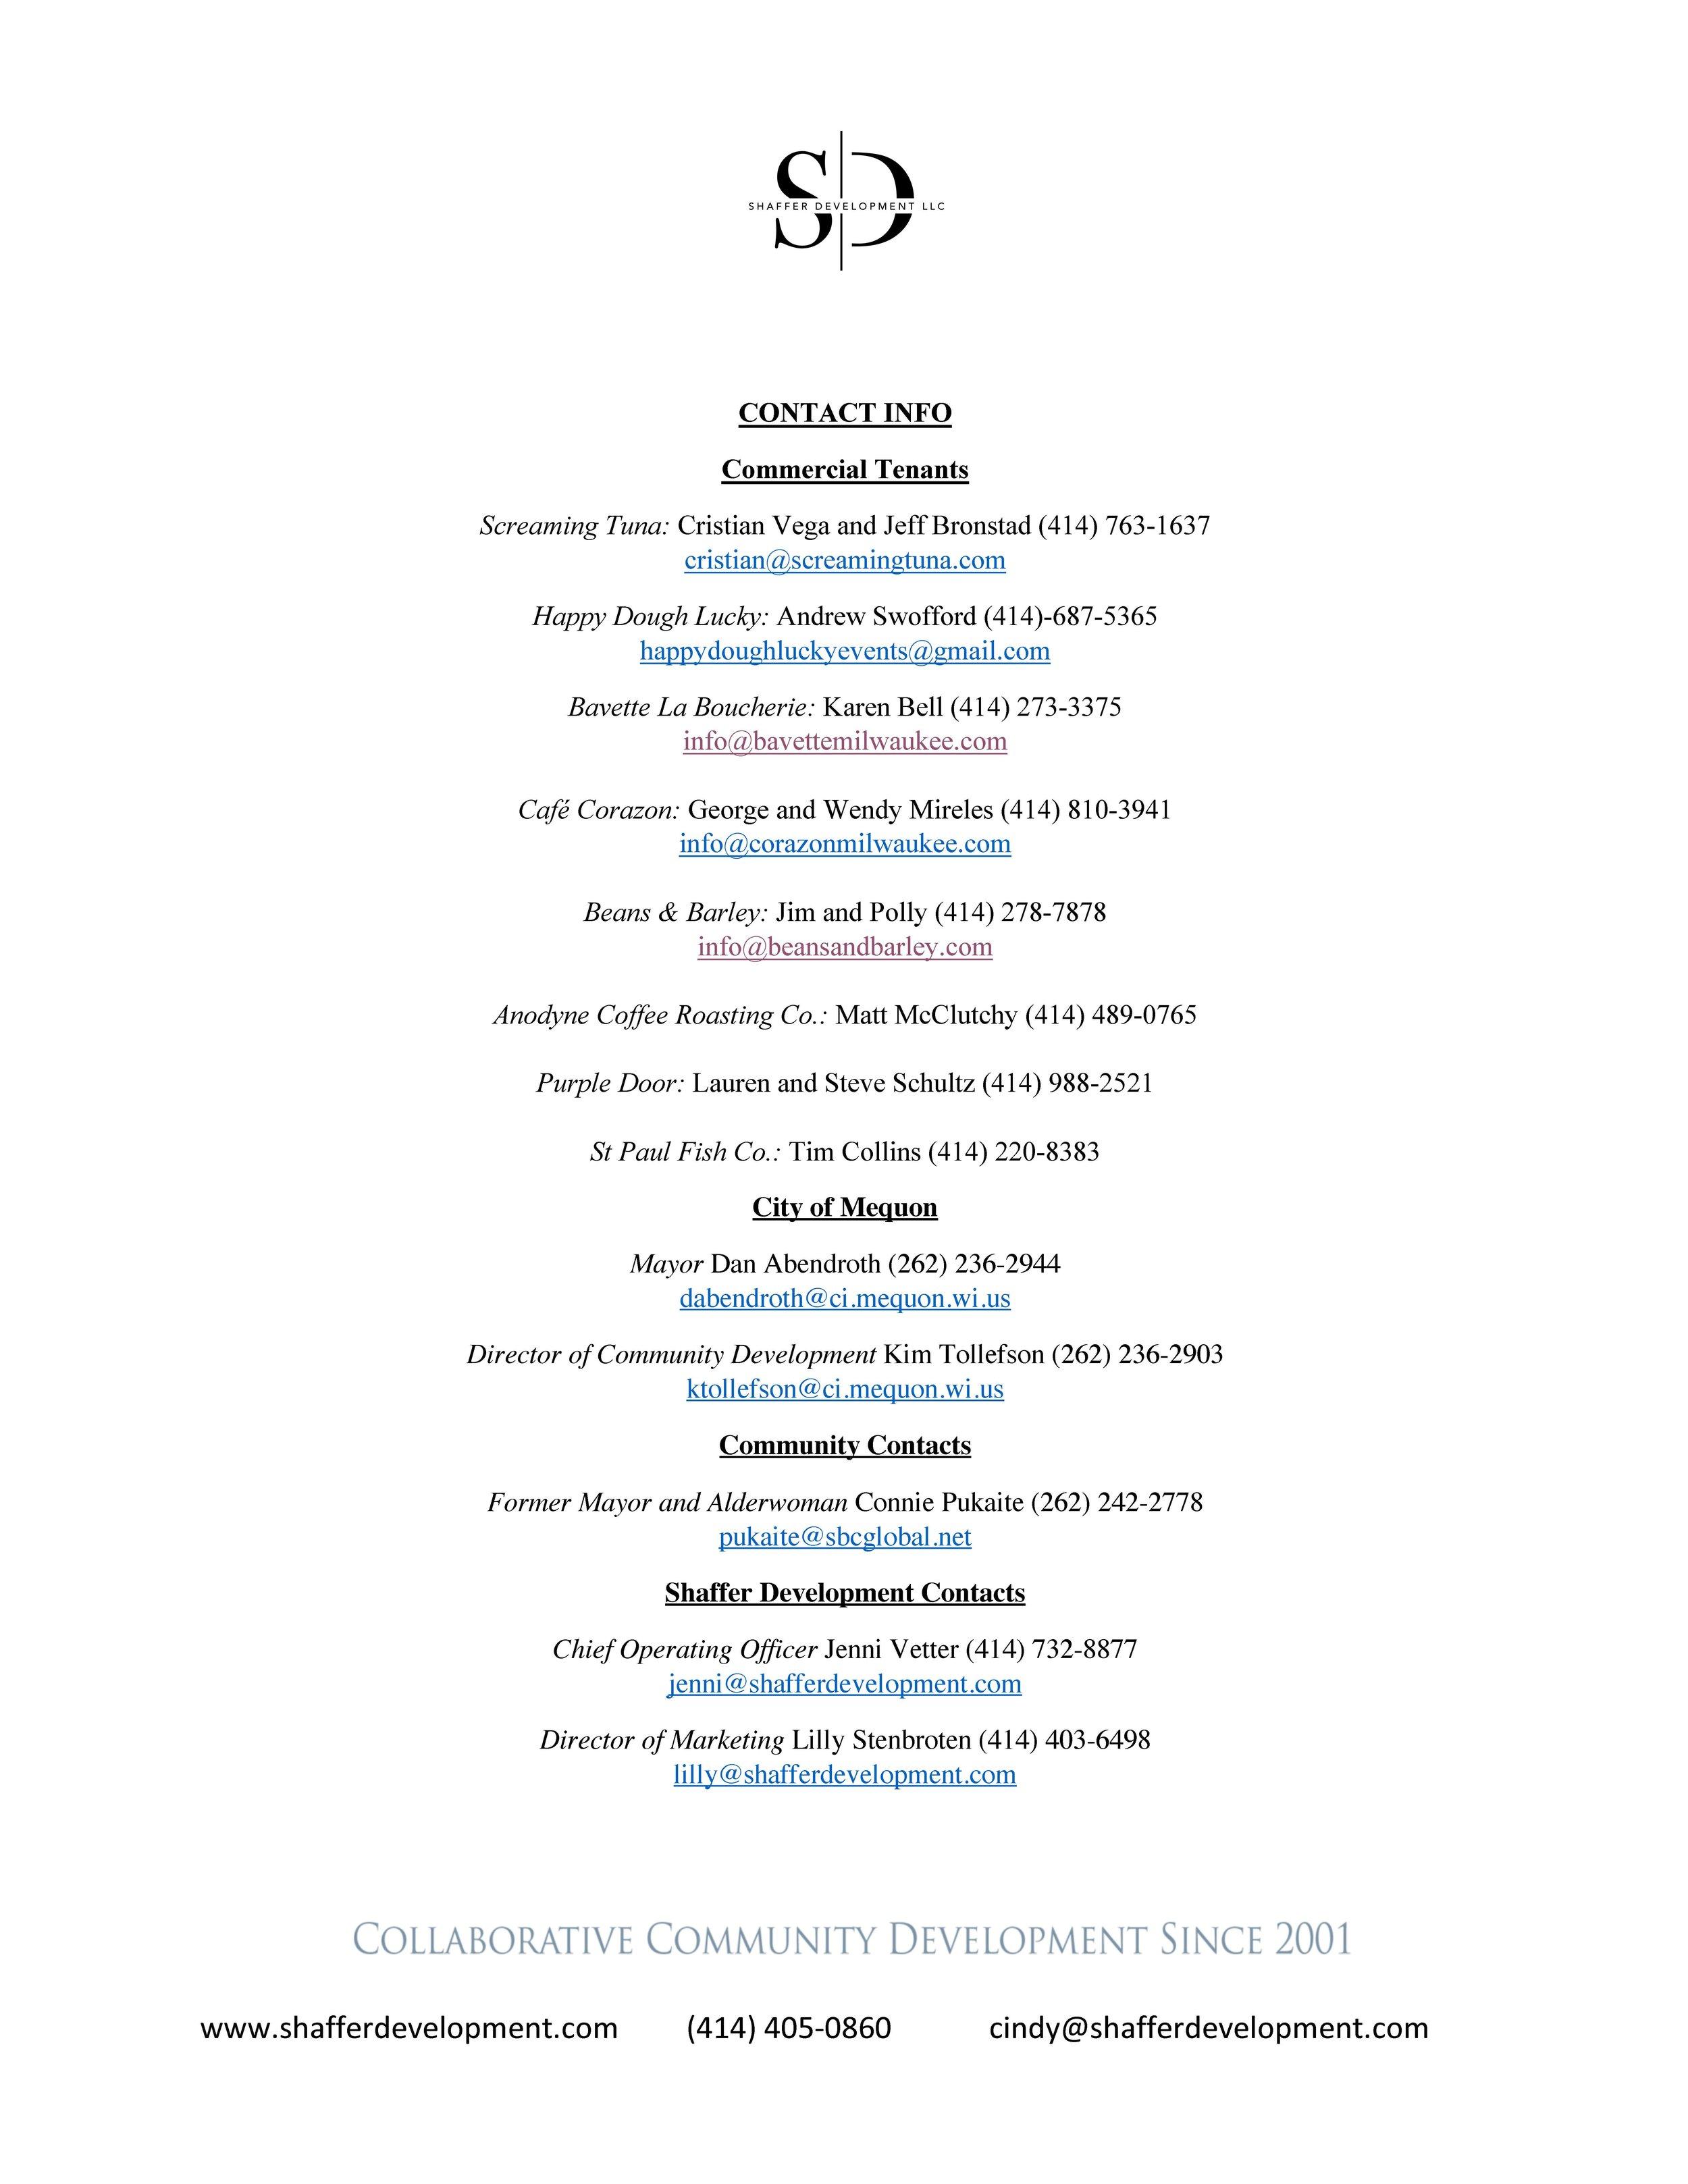 Screaming Tuna Press Release_Page_3.jpg